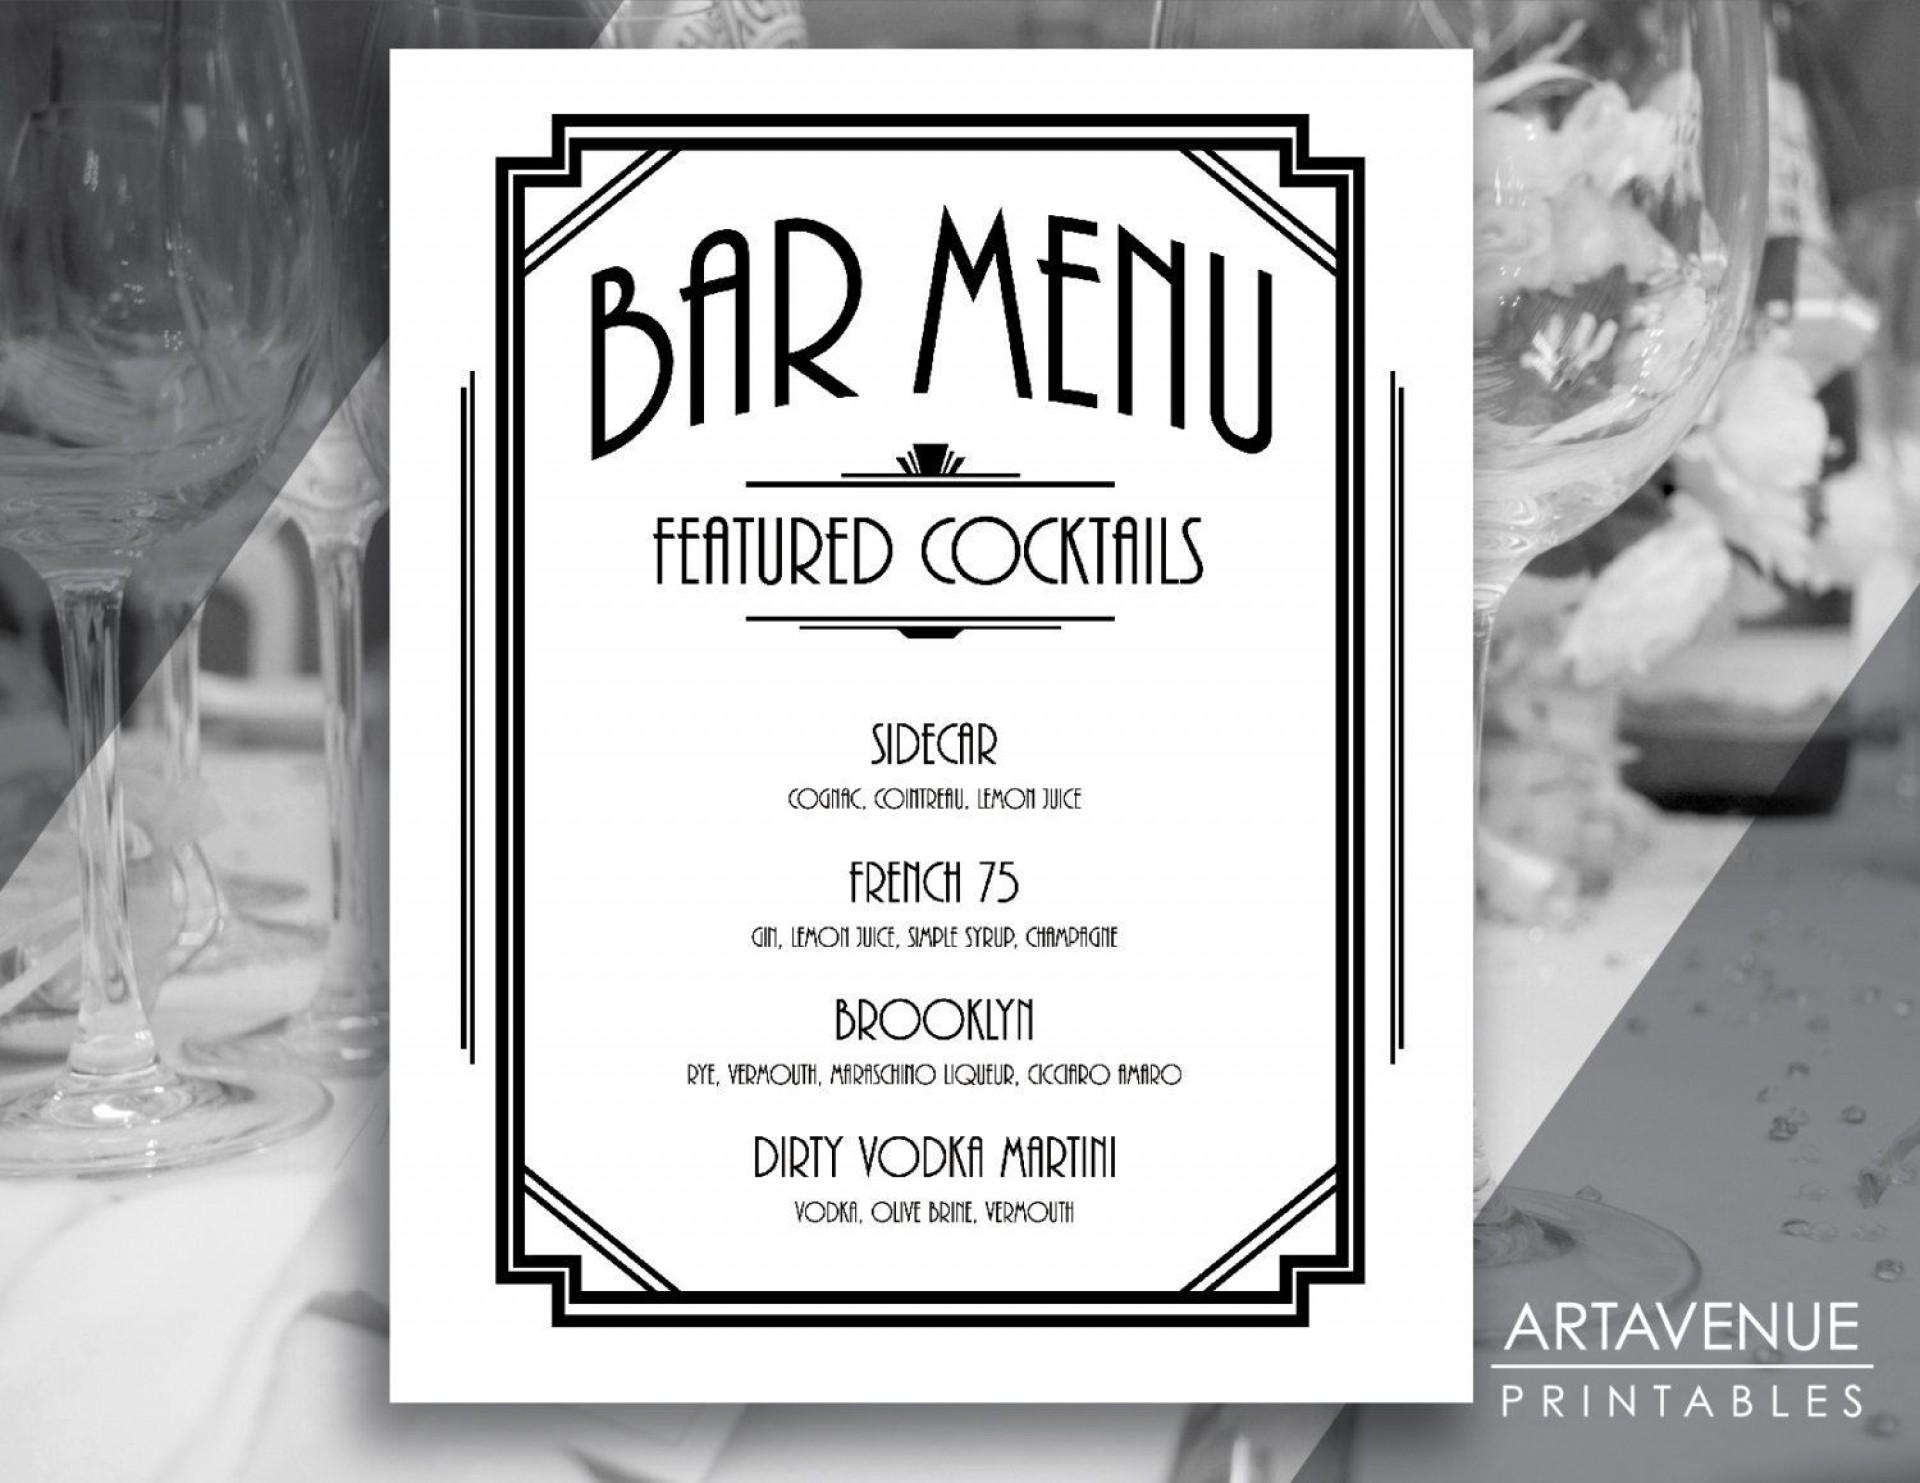 004 Unusual Bar Menu Template Free High Def  Download Snack1920